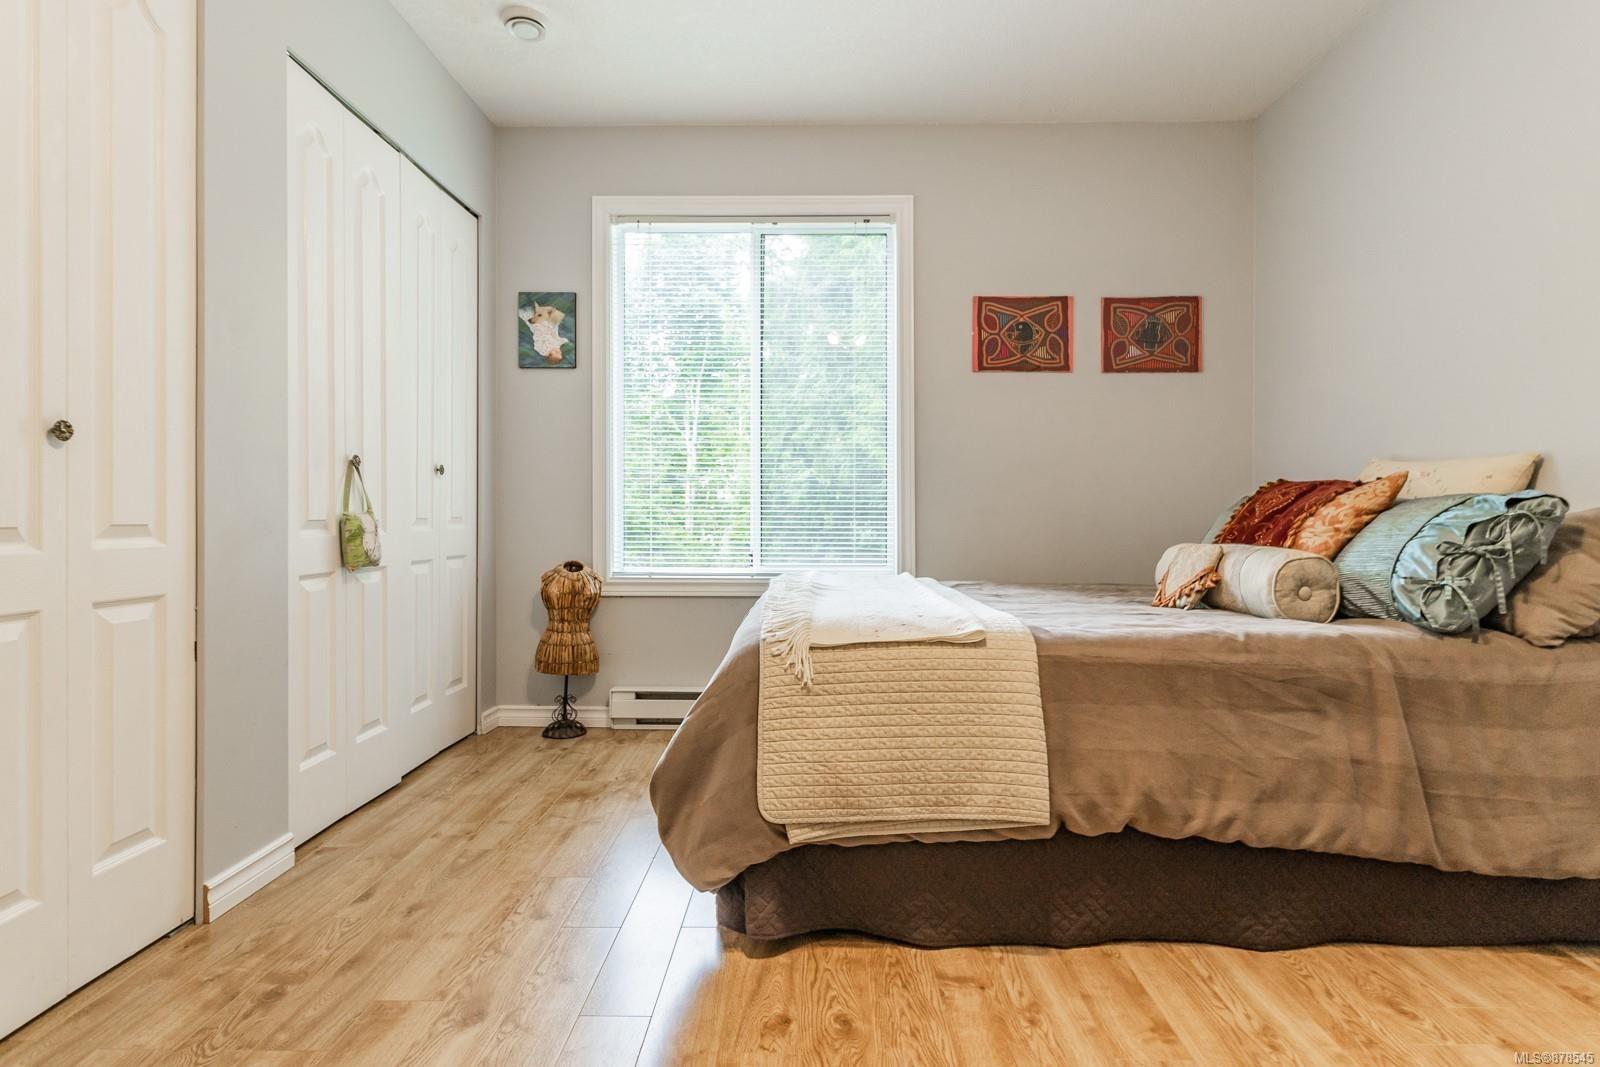 Photo 22: Photos: 1070 Symons Cres in : PQ Qualicum Beach House for sale (Parksville/Qualicum)  : MLS®# 878545